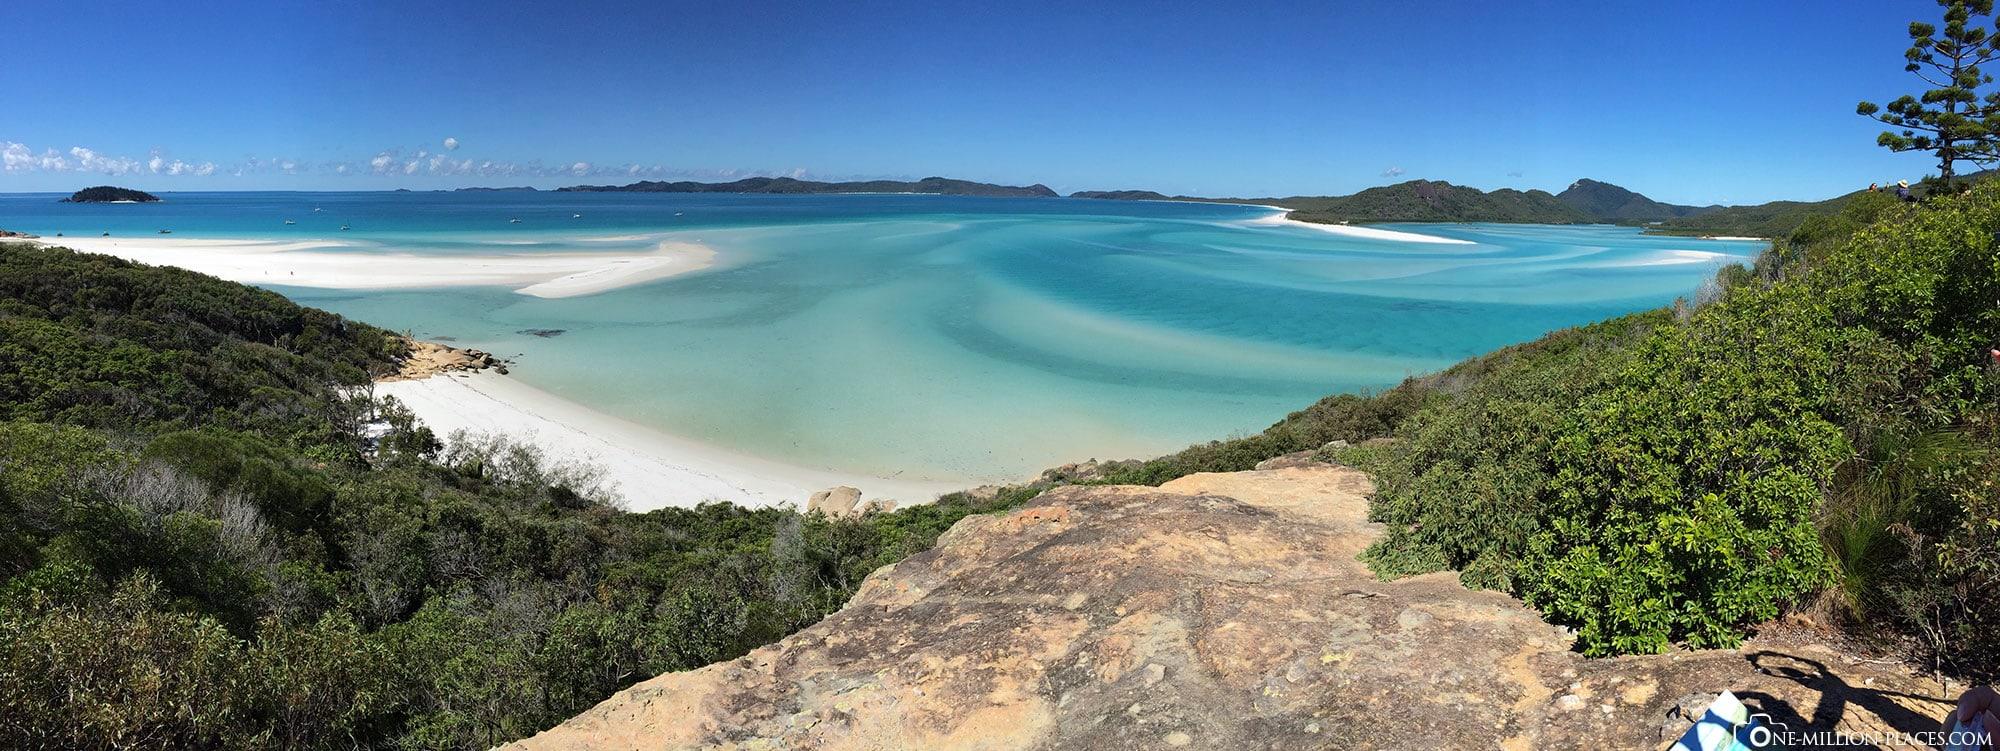 Panorama, Whitsunday Island, Whitsunday Islands National Park, Airlie Beach, Tour Ocean Rafting, Australien, Bundesstaat Queensland, Reisebericht